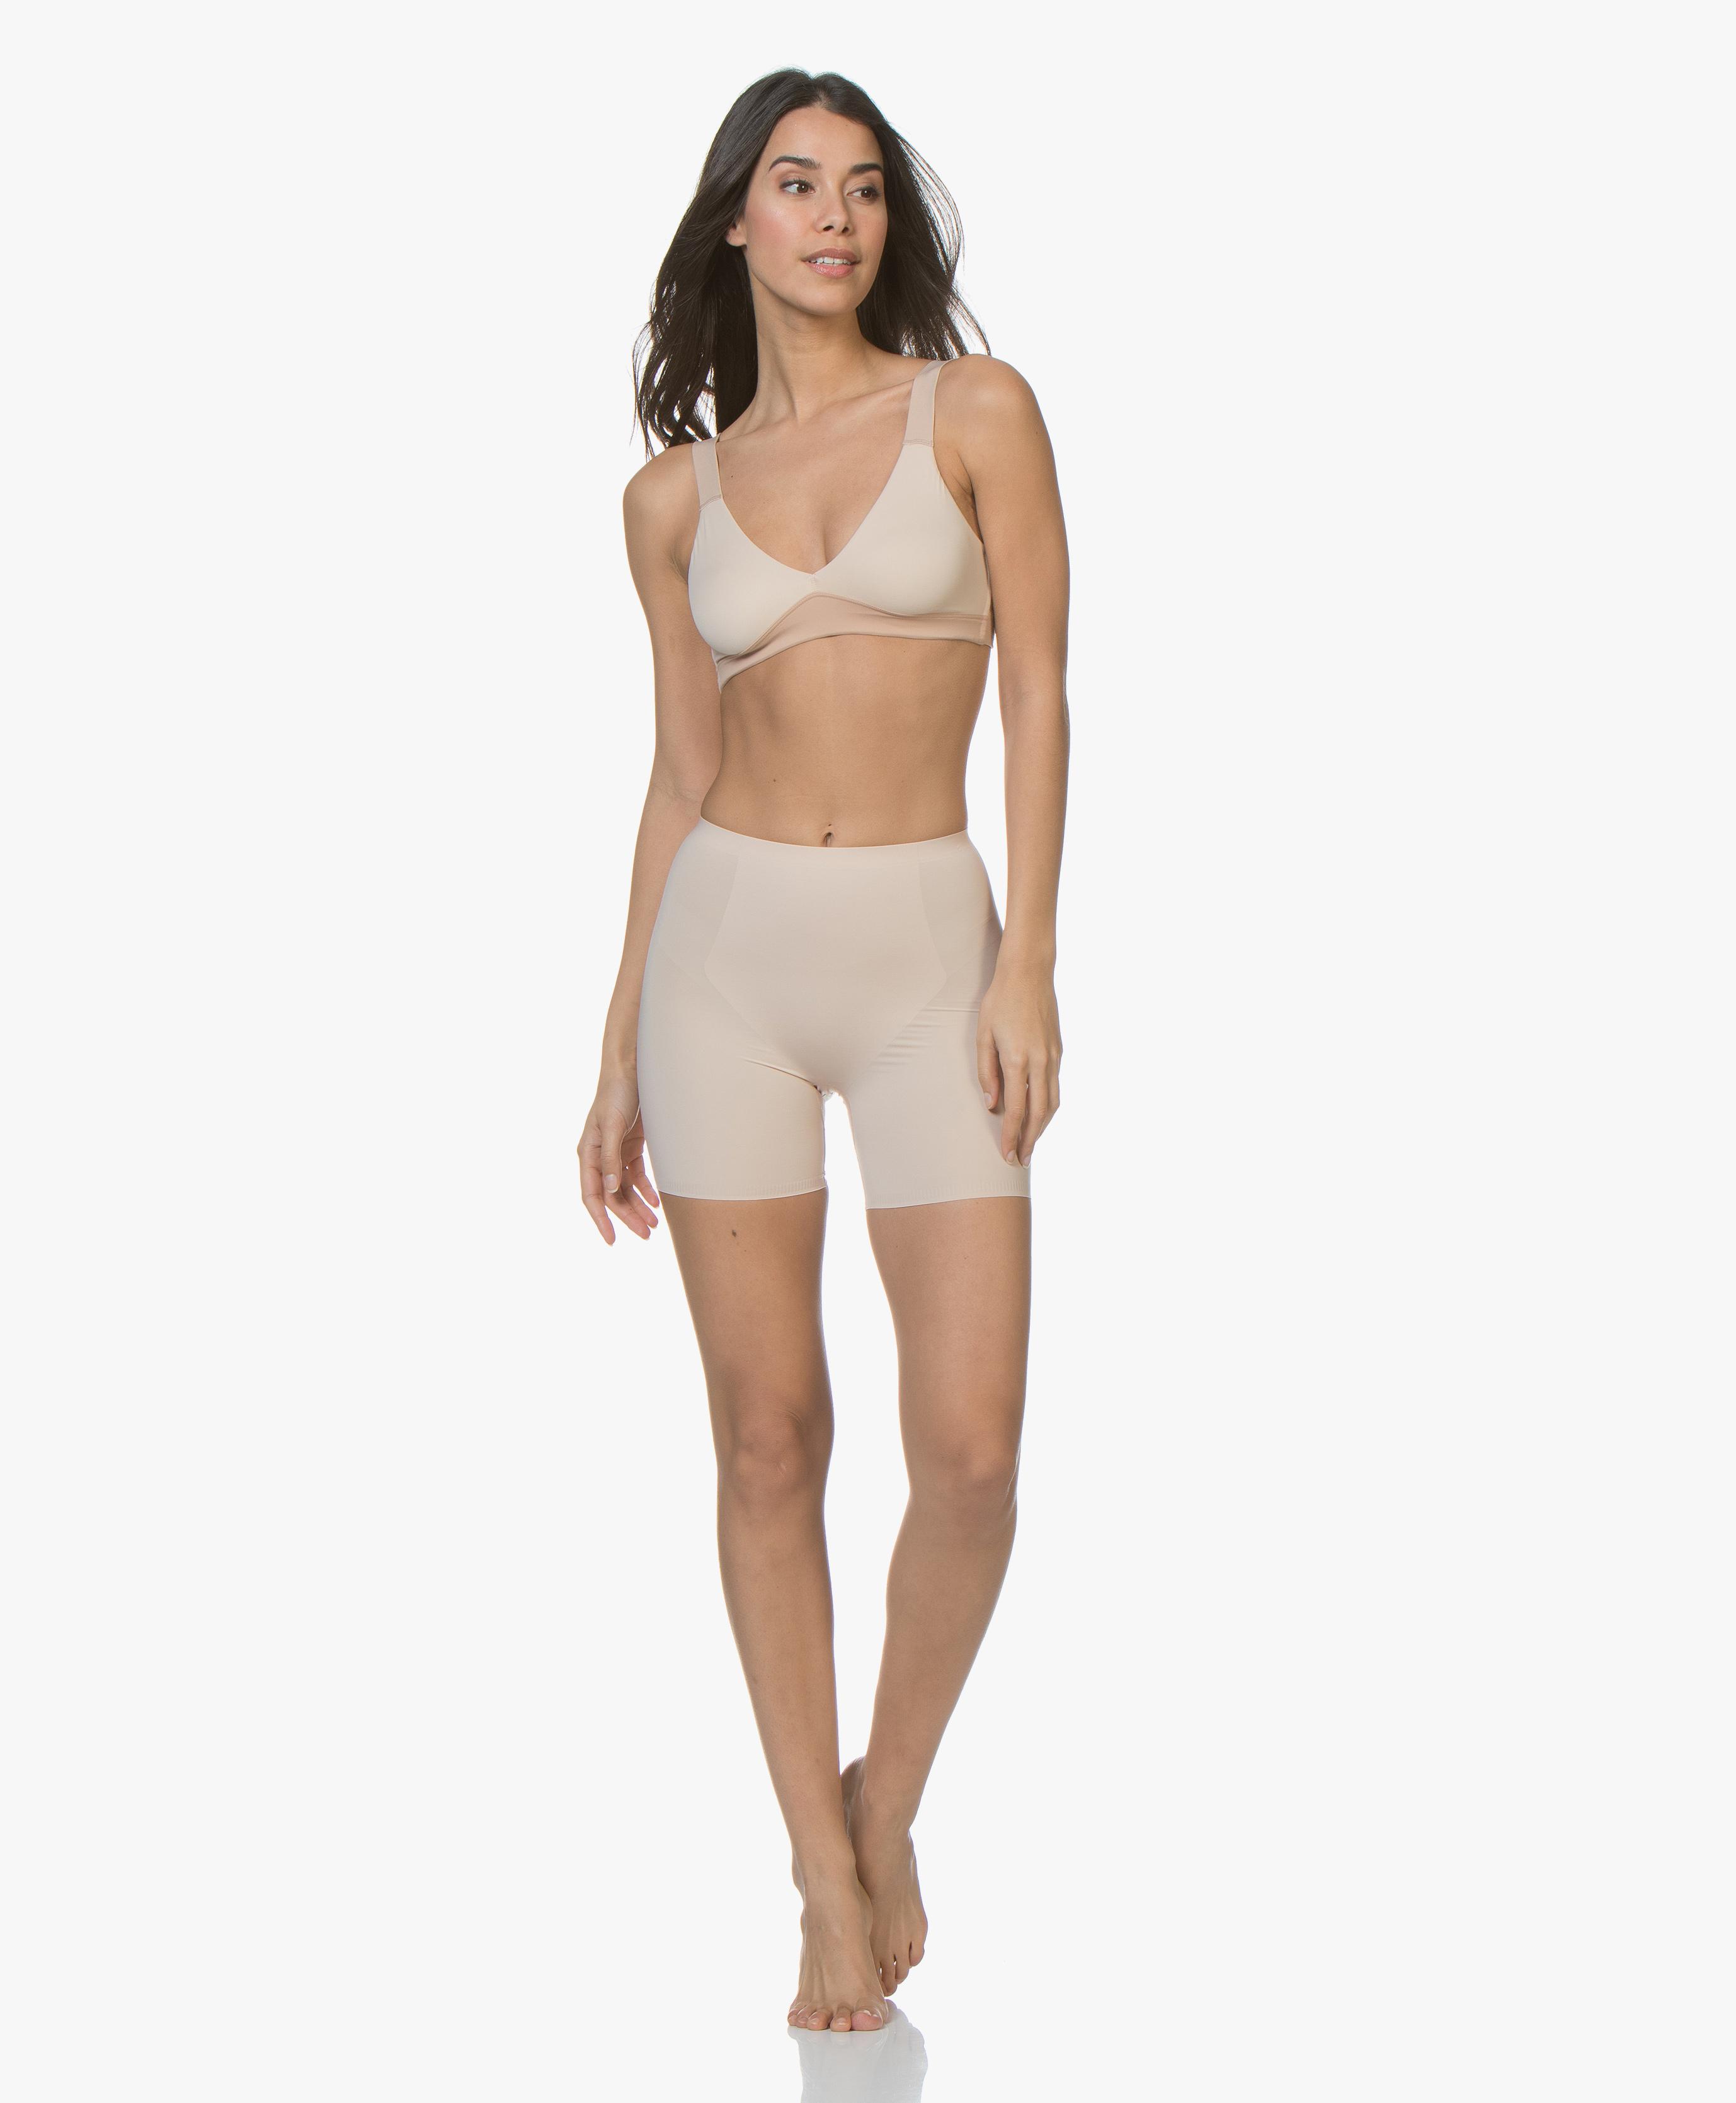 31f128736c93b SPANX® Thinstincts Girl Short - Soft Nude - Spanx Shapewear